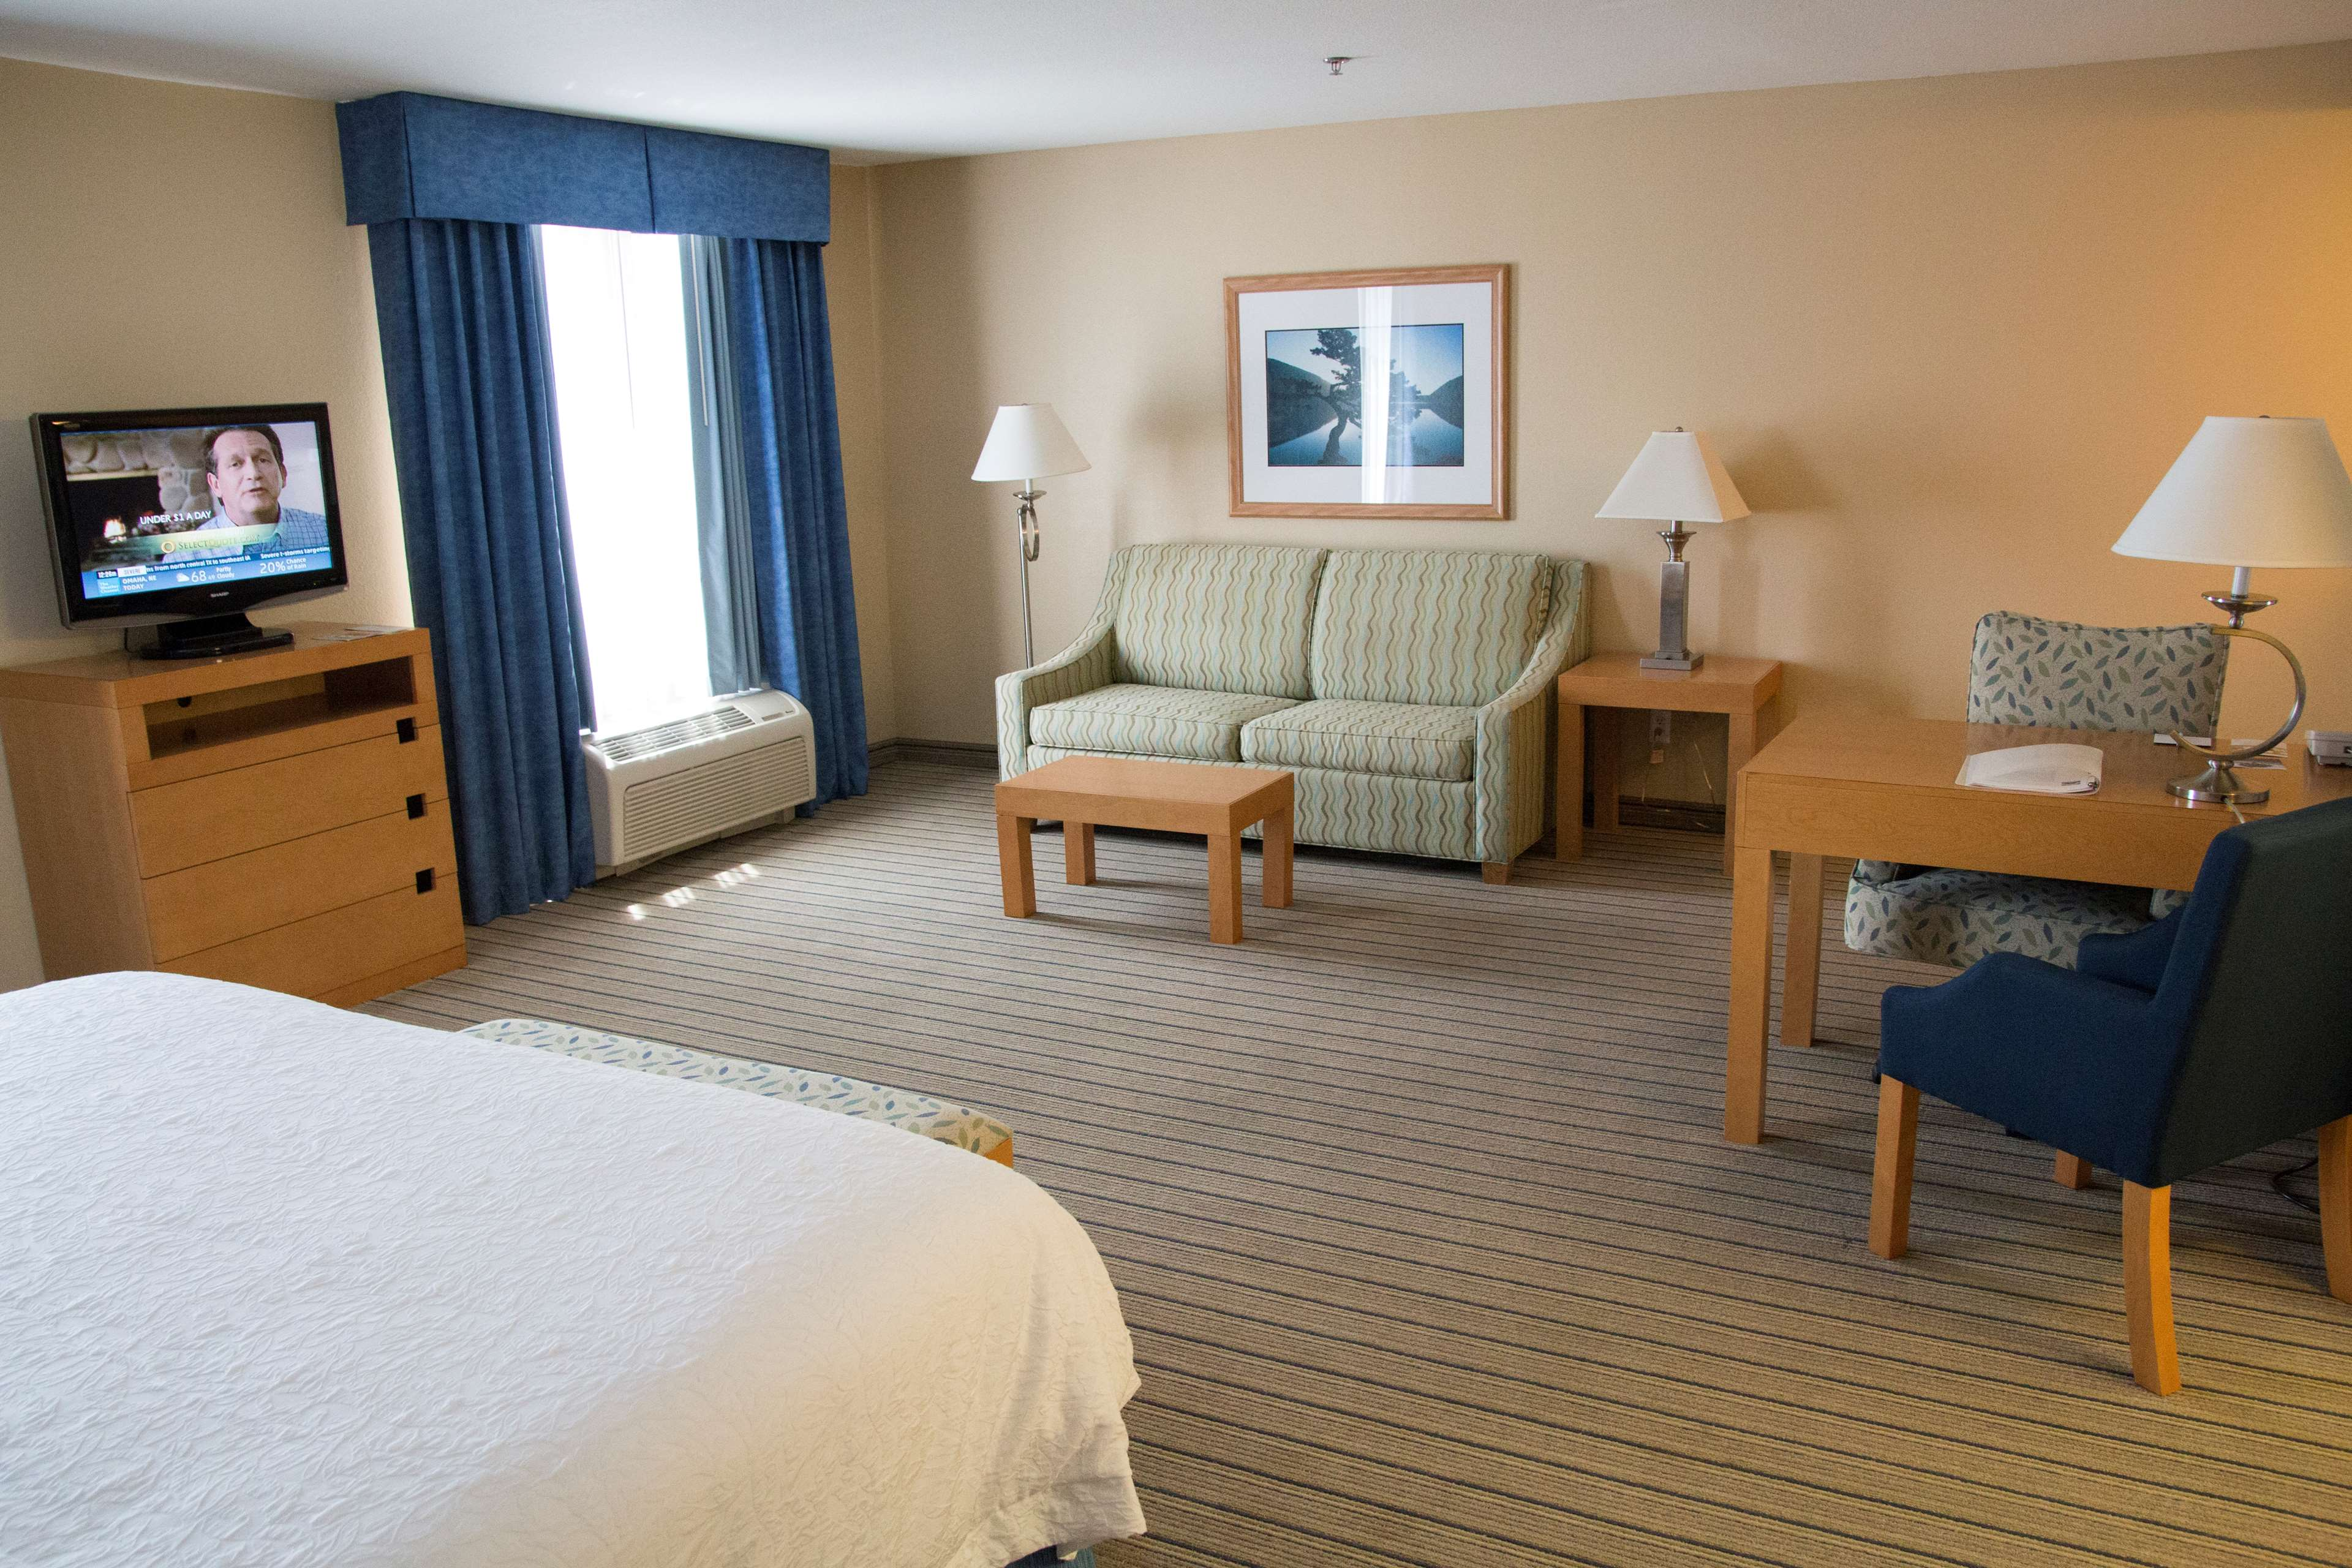 Hampton Inn & Suites Madera image 39